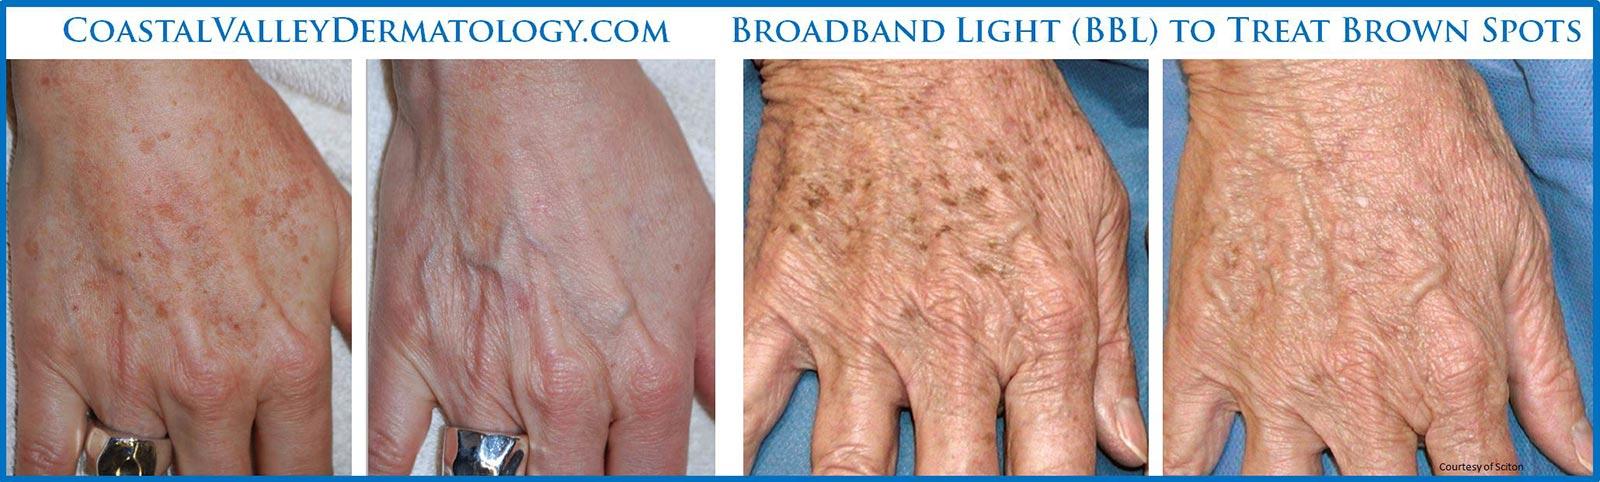 coastal-valley-dermatology-carmel-hands-brown-spots-treatment-photo